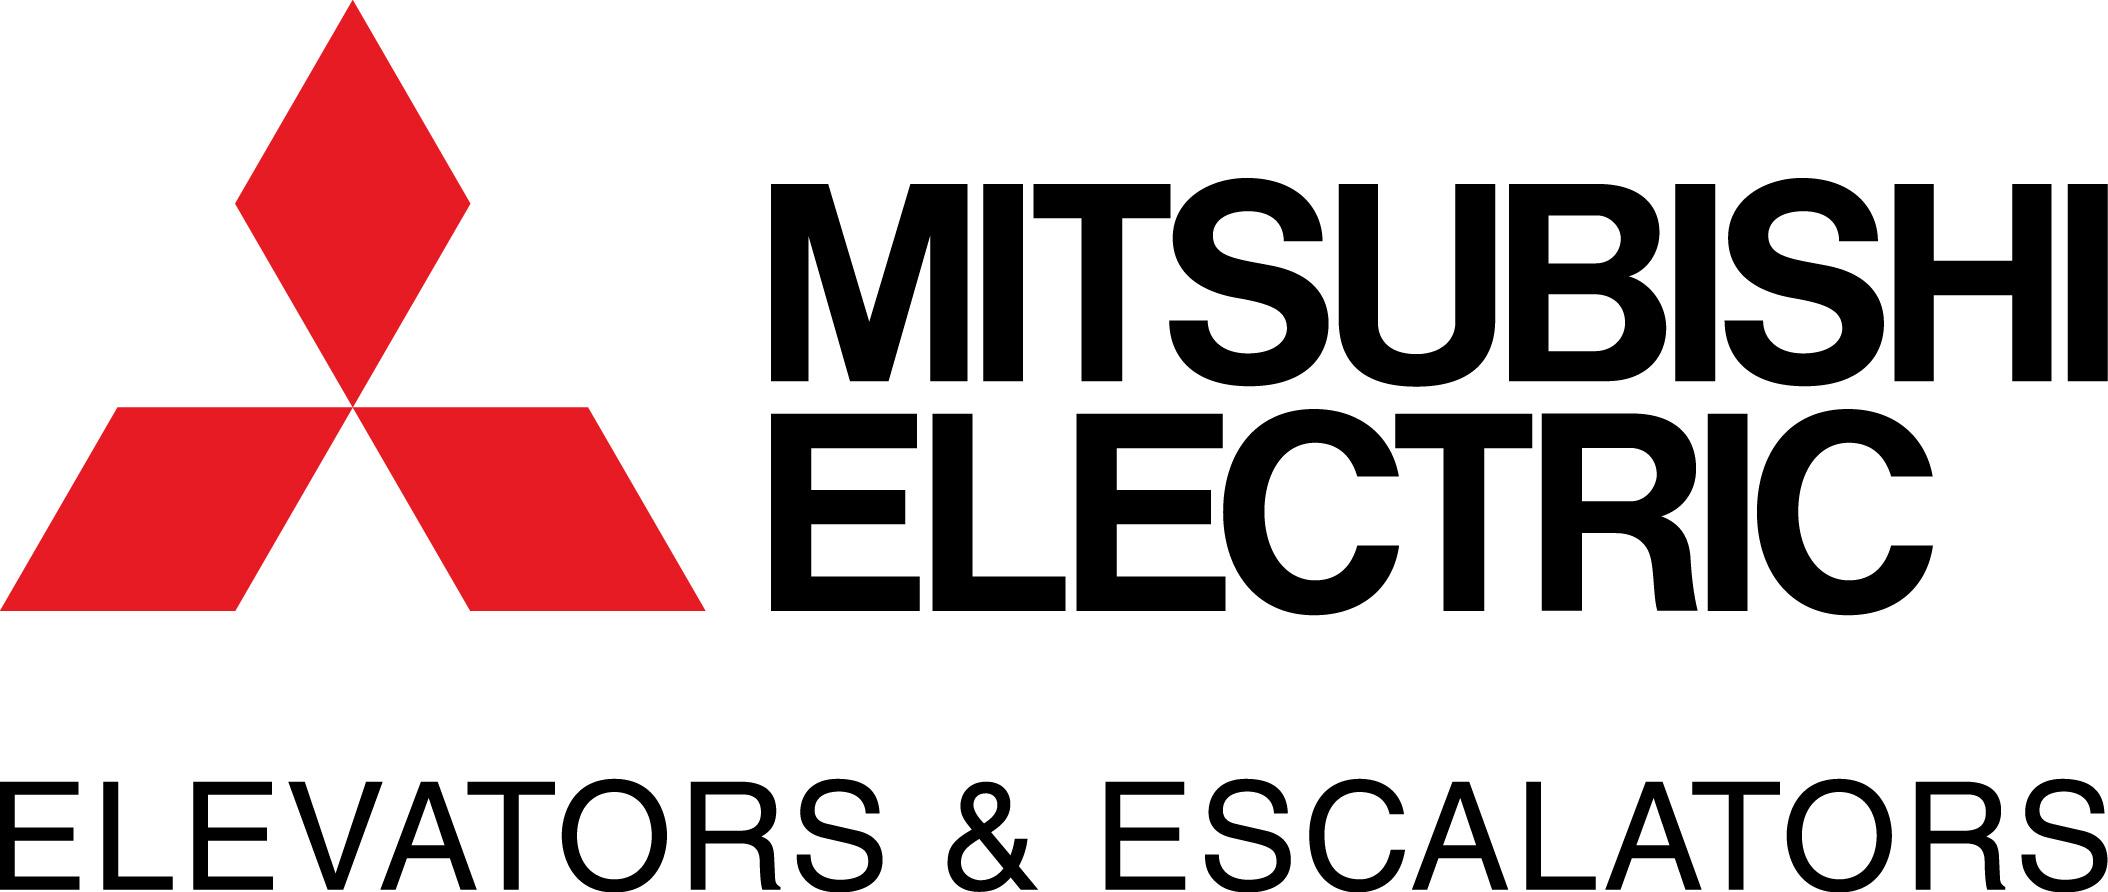 Firm Leaders - Mitsubishi Electric logo